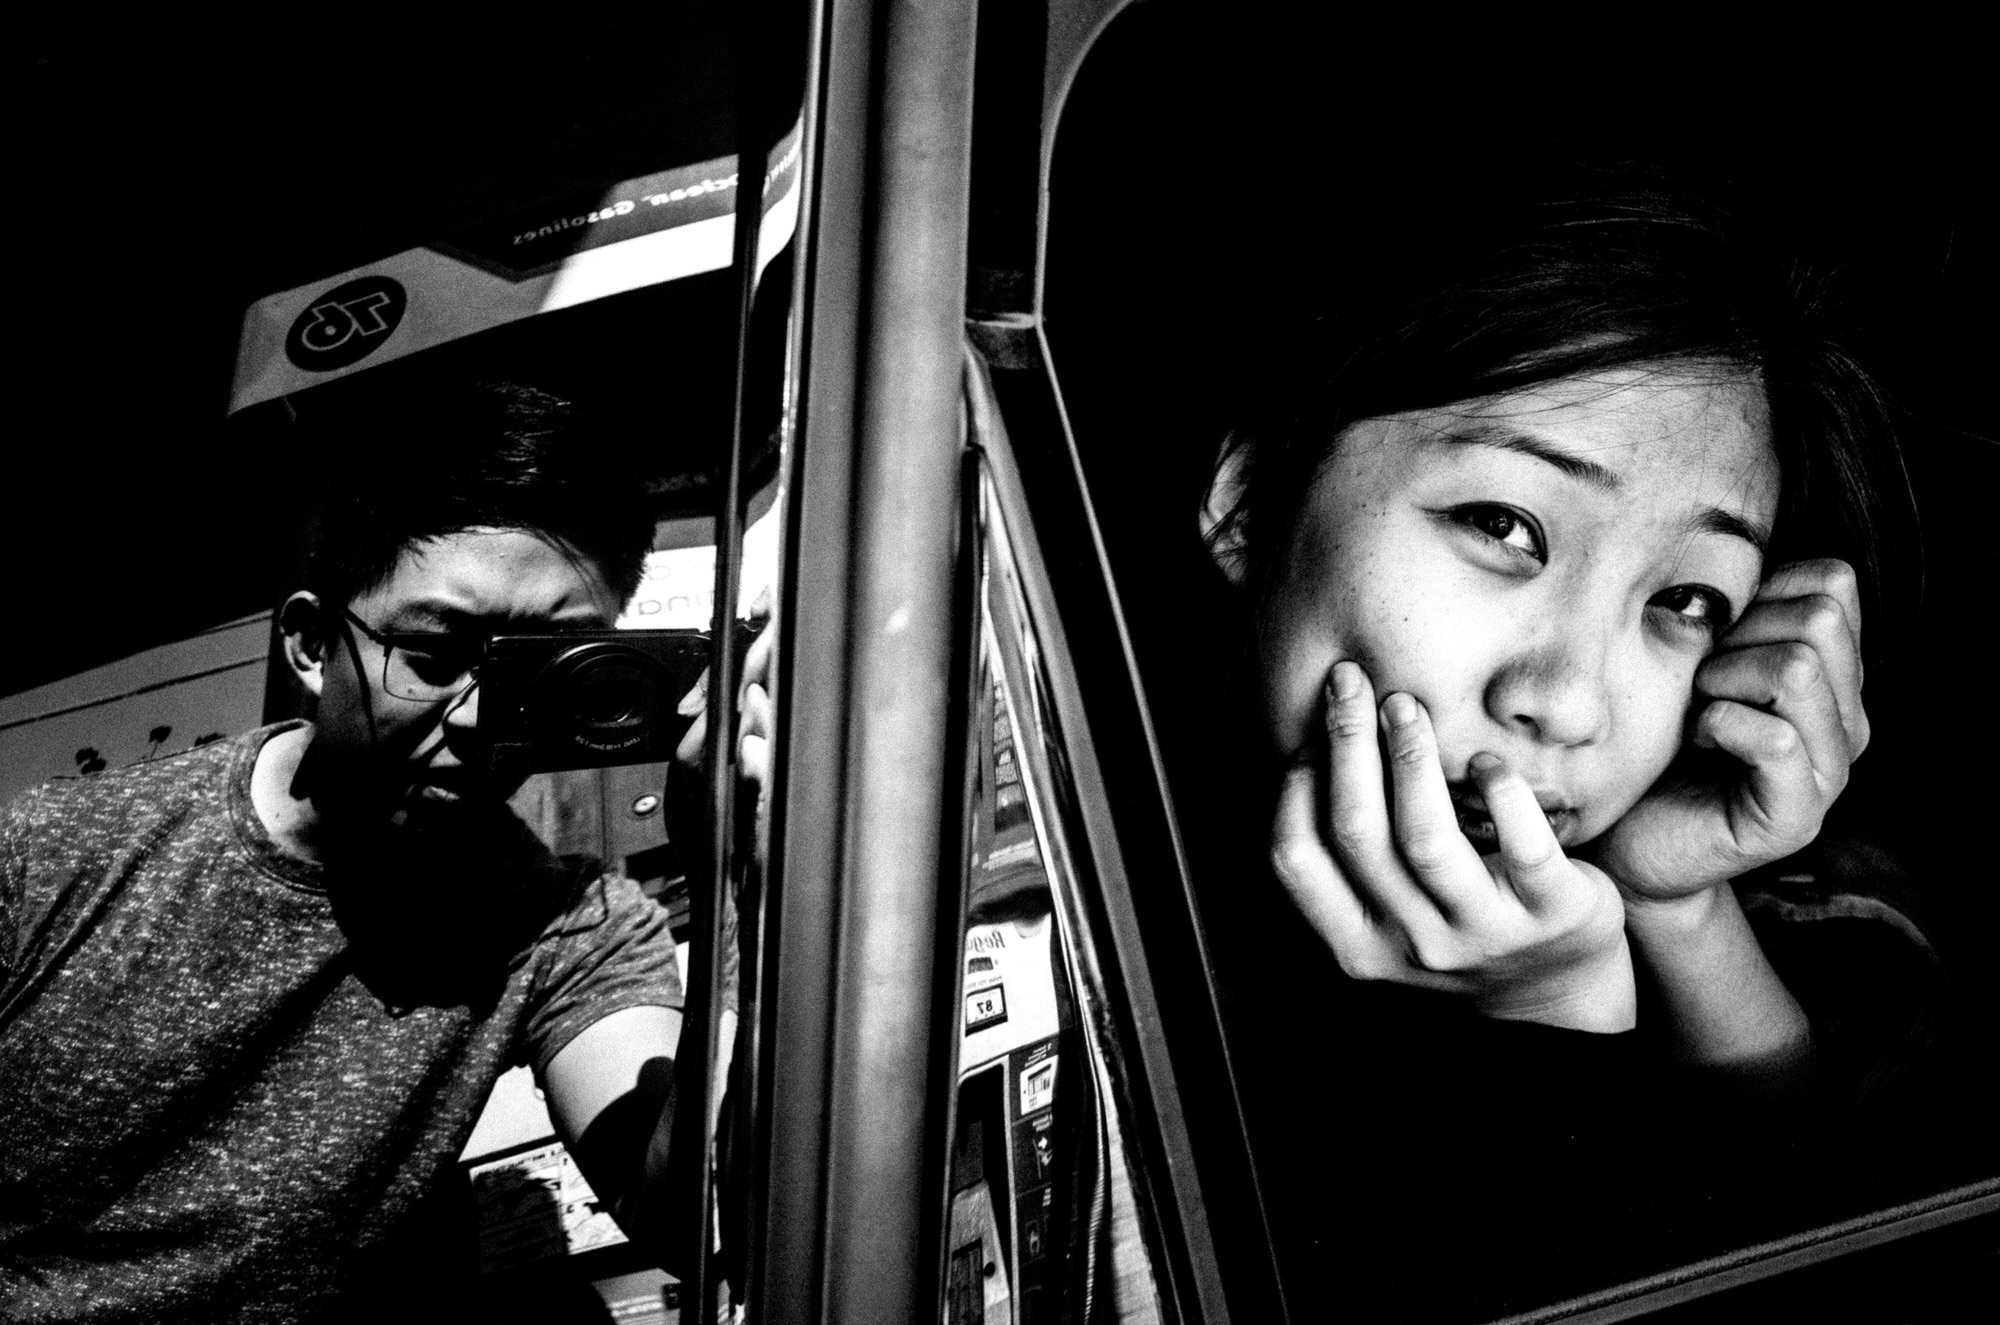 001 ERIC KIM PHOTOGRAPHY00003